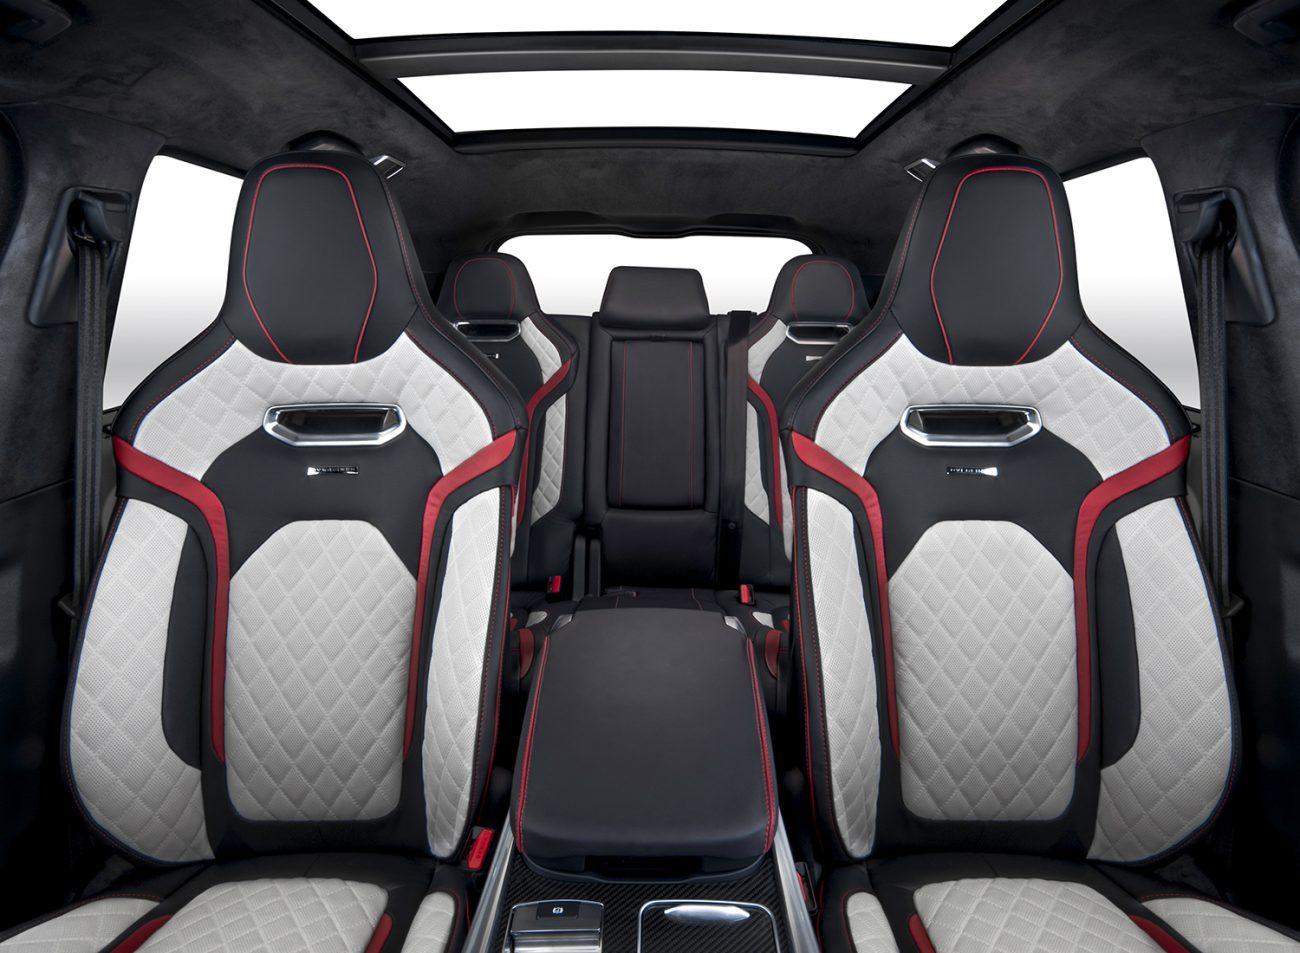 Overfinch bespoke interior in white red and black for Range Rover Sport SVR